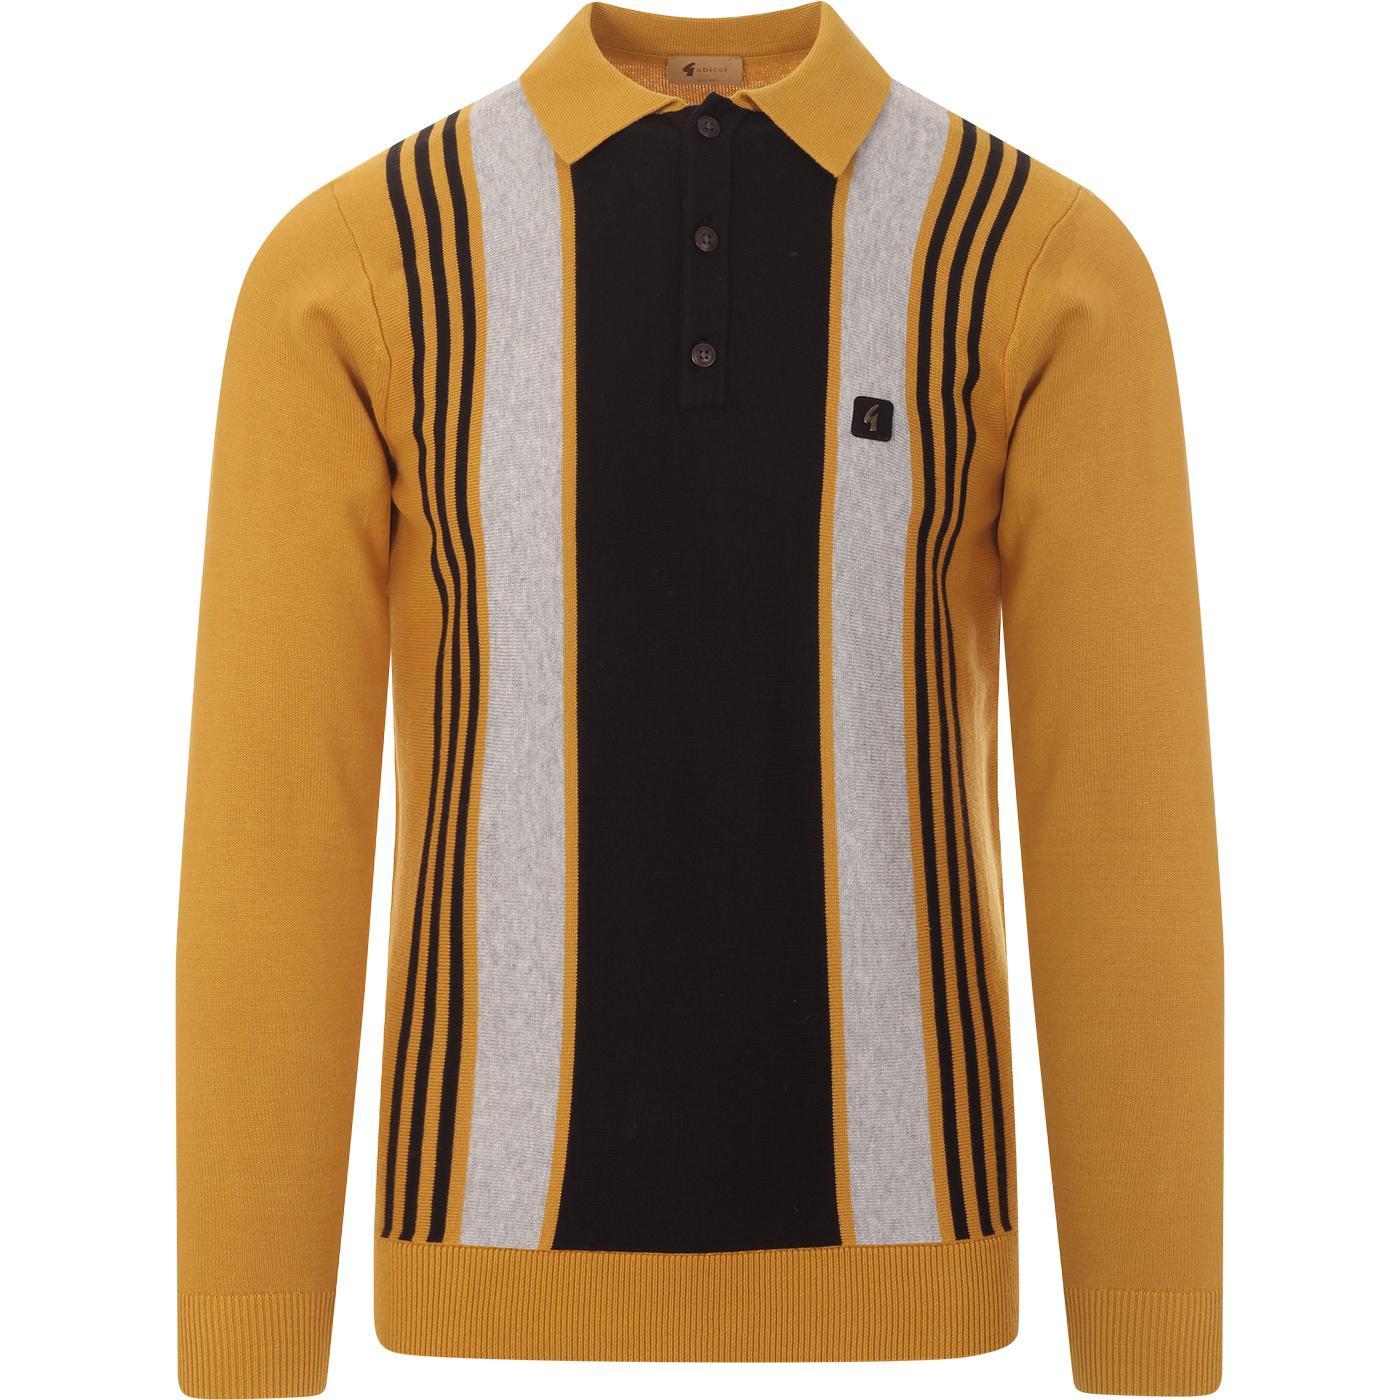 Searle GABICCI VINTAGE 60s Mod Knit Polo in Dijon